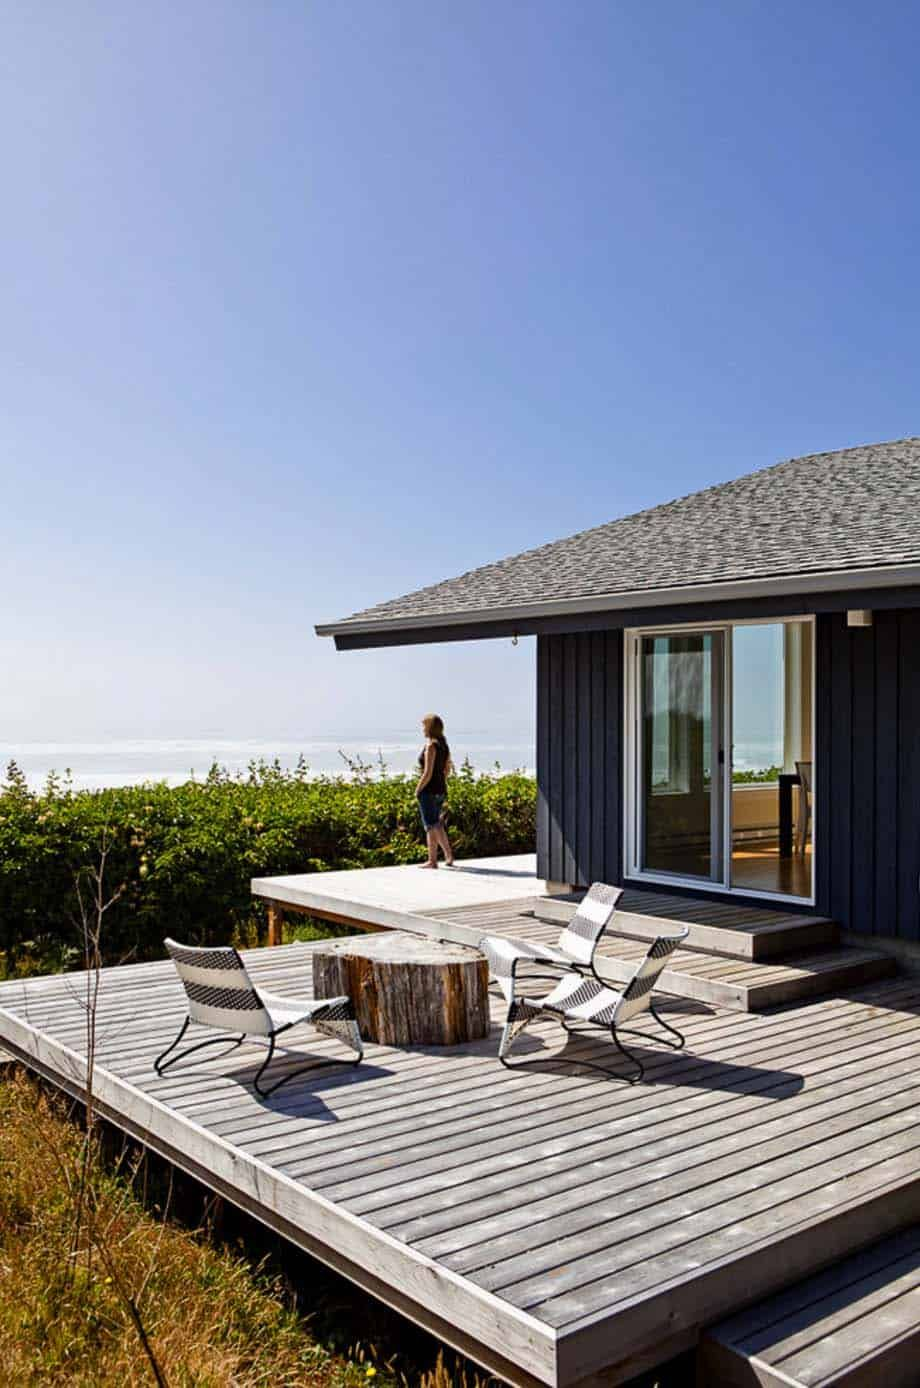 30 Amazing Beach Style Deck Ideas Promoting Relaxation Beach House Deck Modern Beach House House Deck